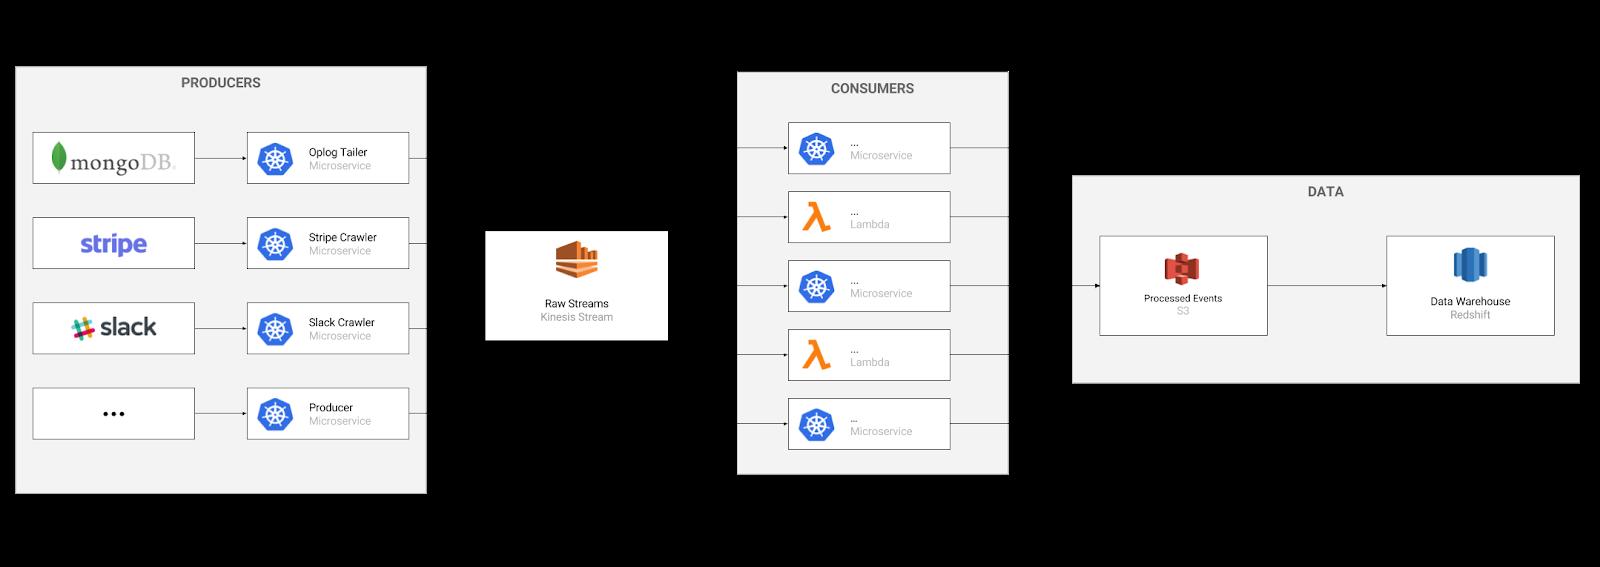 Buffer Unified Data Architecture